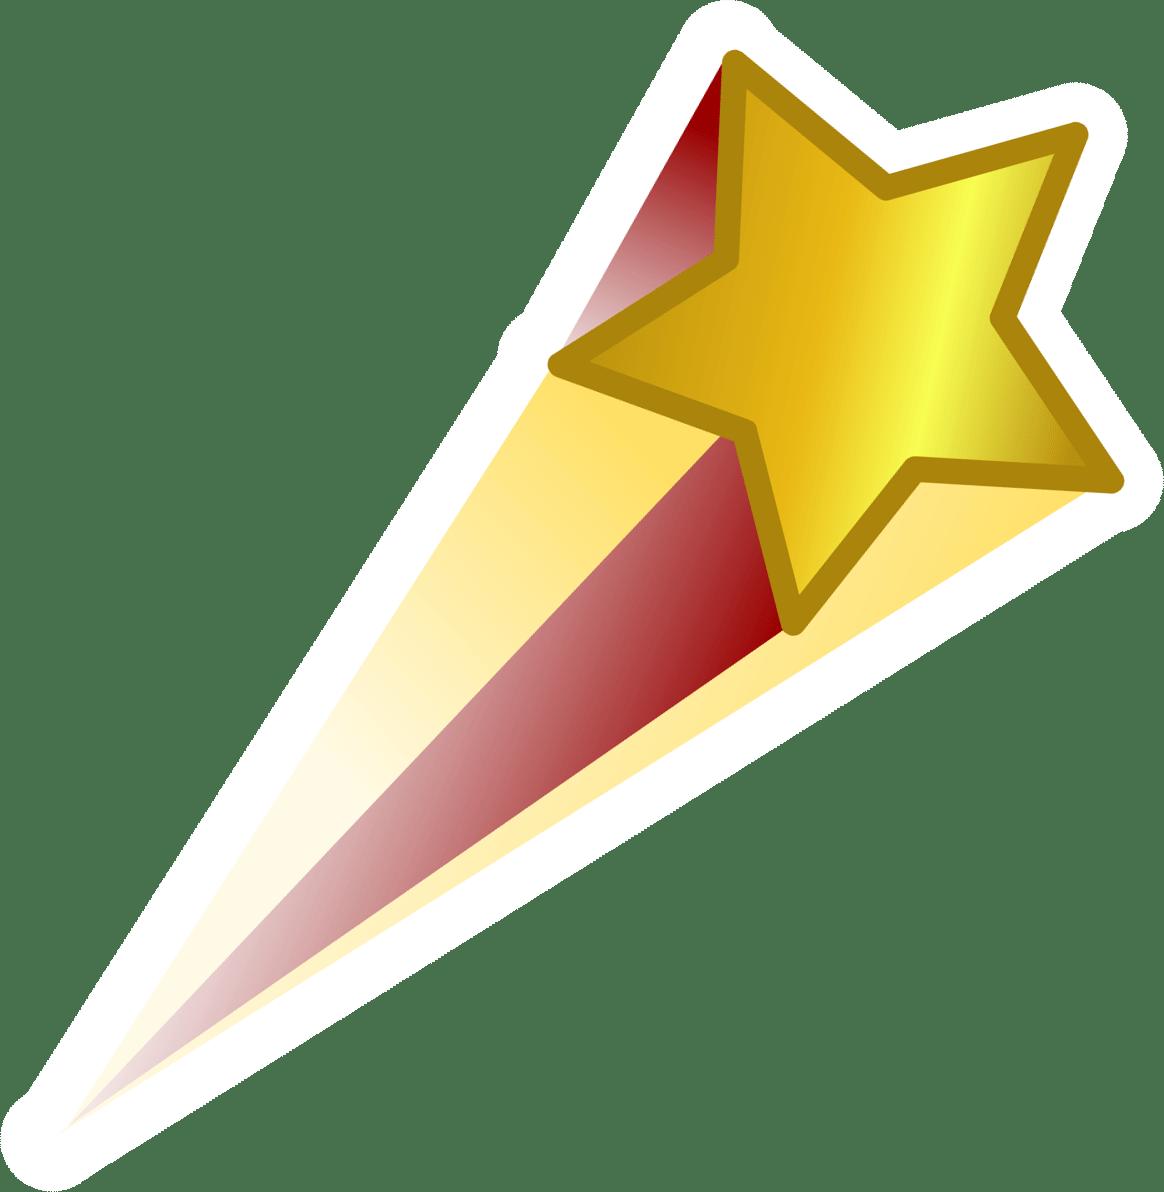 Estrella Fugaz Roja y Dorada PNG transparente.